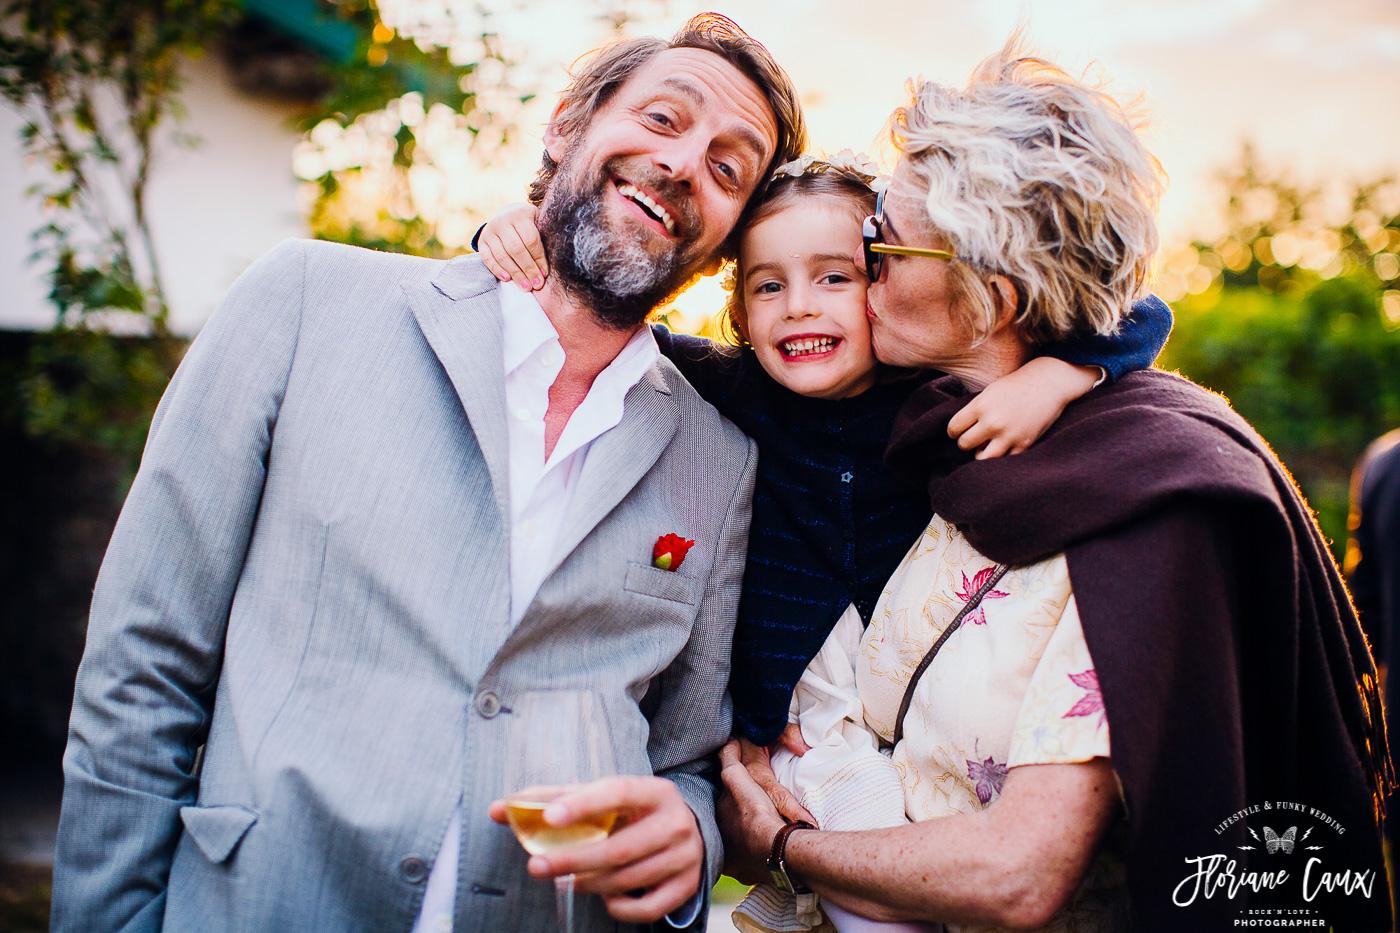 photographe-mariage-pays-basque-Floriane-Caux (92)